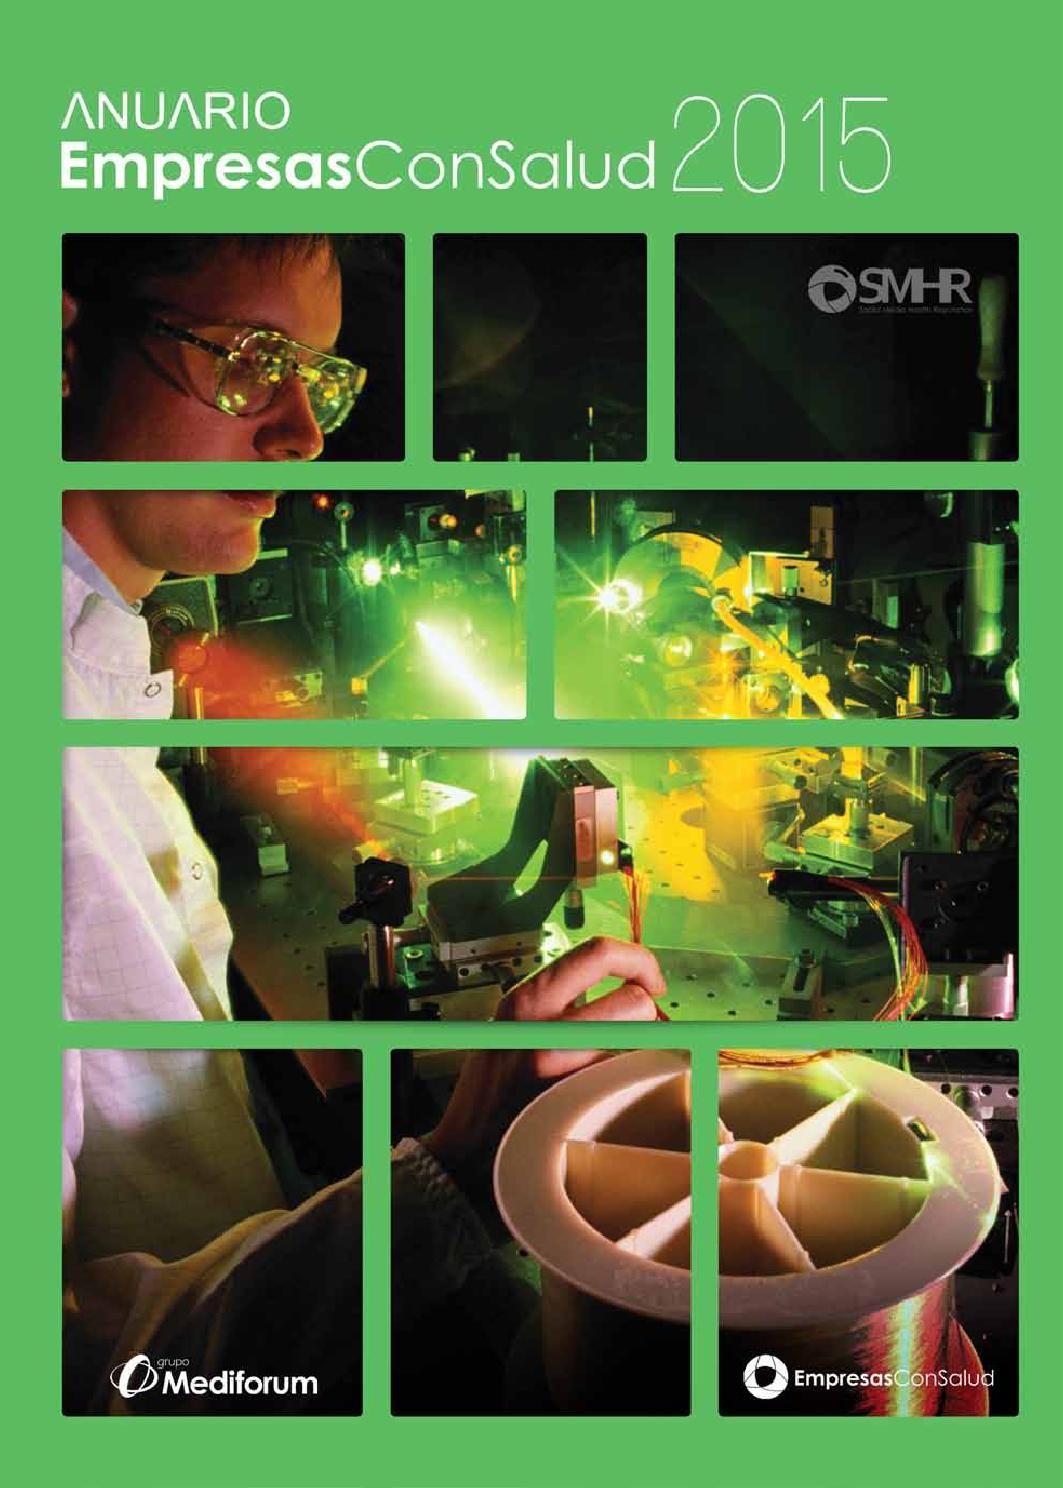 Anuario EmpresasConSalud 2015 by ConSalud.es - issuu 79ce74d928